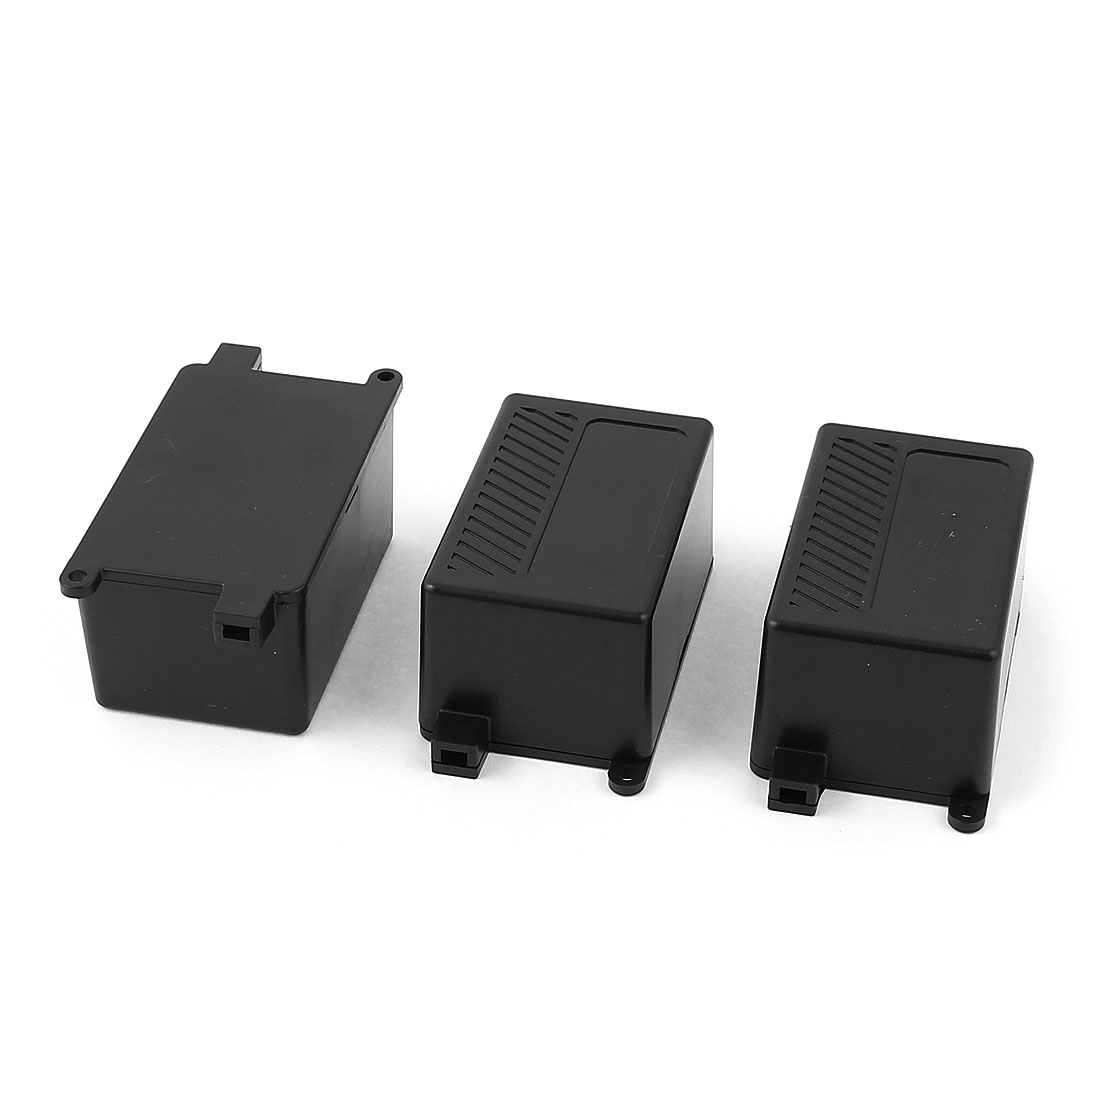 Outdoor Plastic Protective Case Junction Box Black 68x43x36mm 3pcs